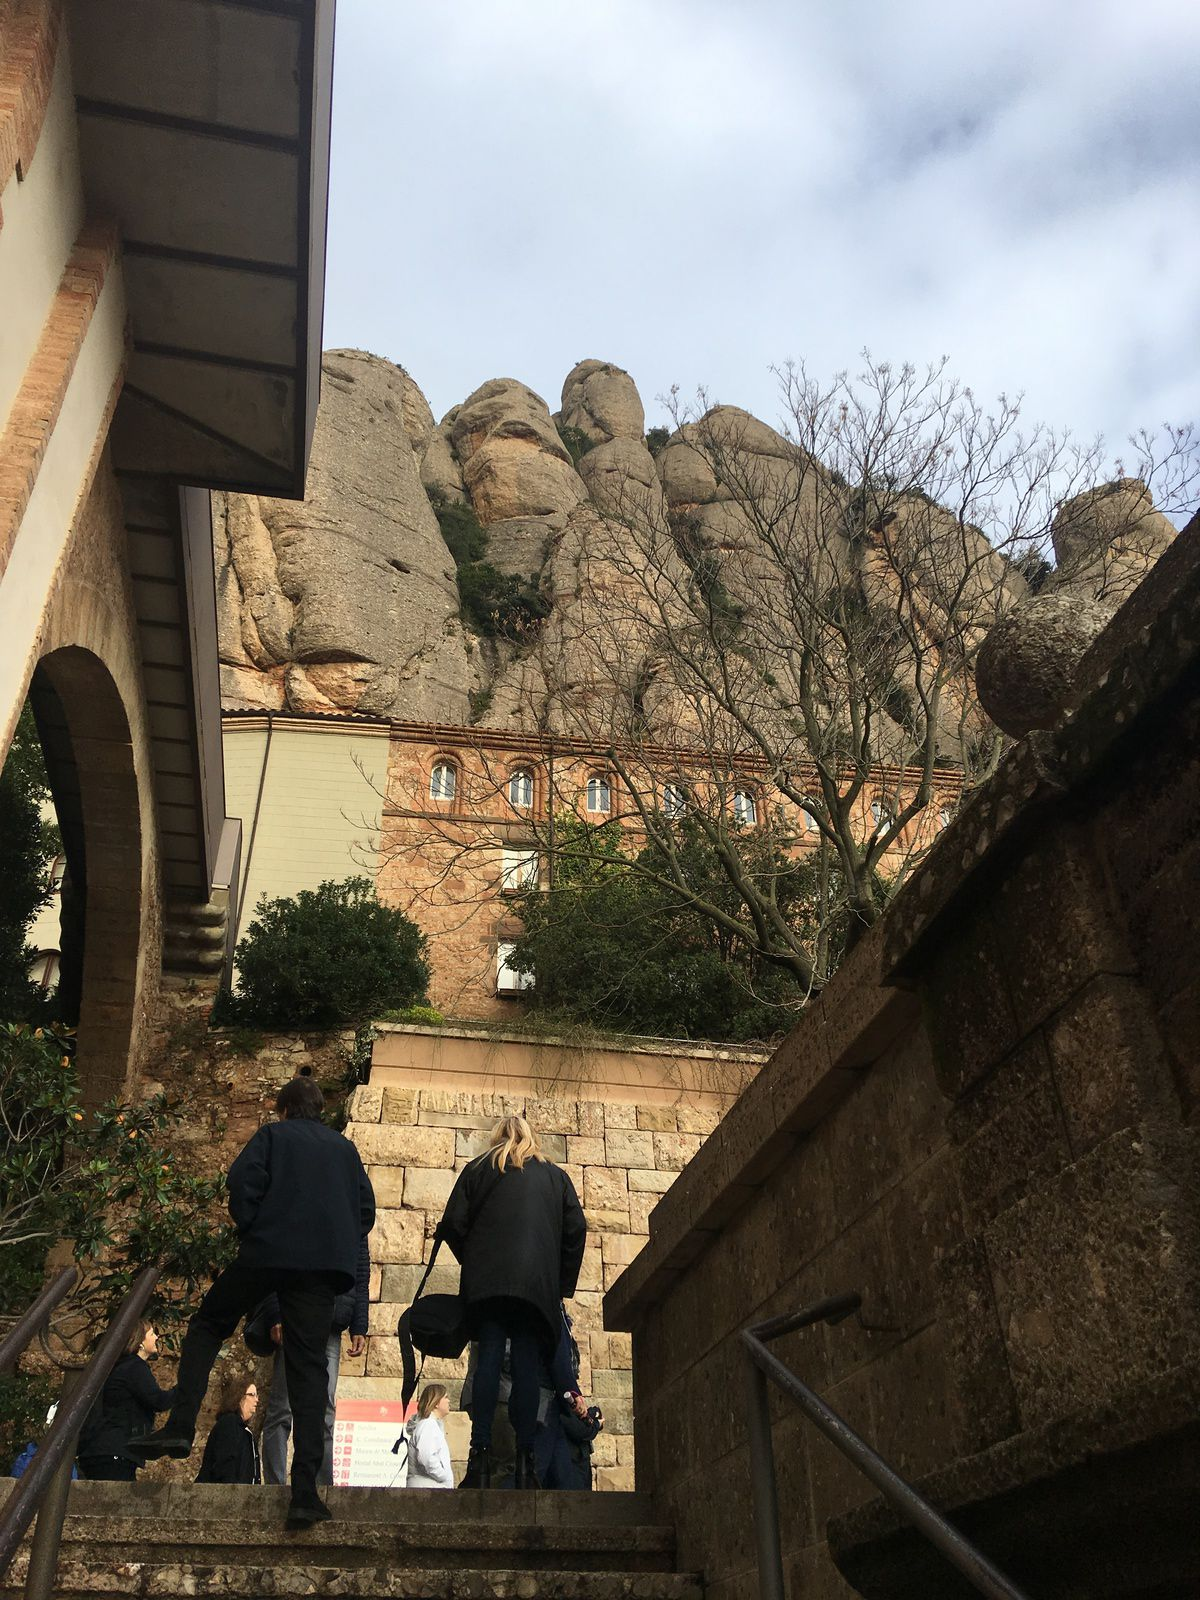 VISITE DE MONTSERRAT A QUELQUES KILOMETRES DE BARCELONE